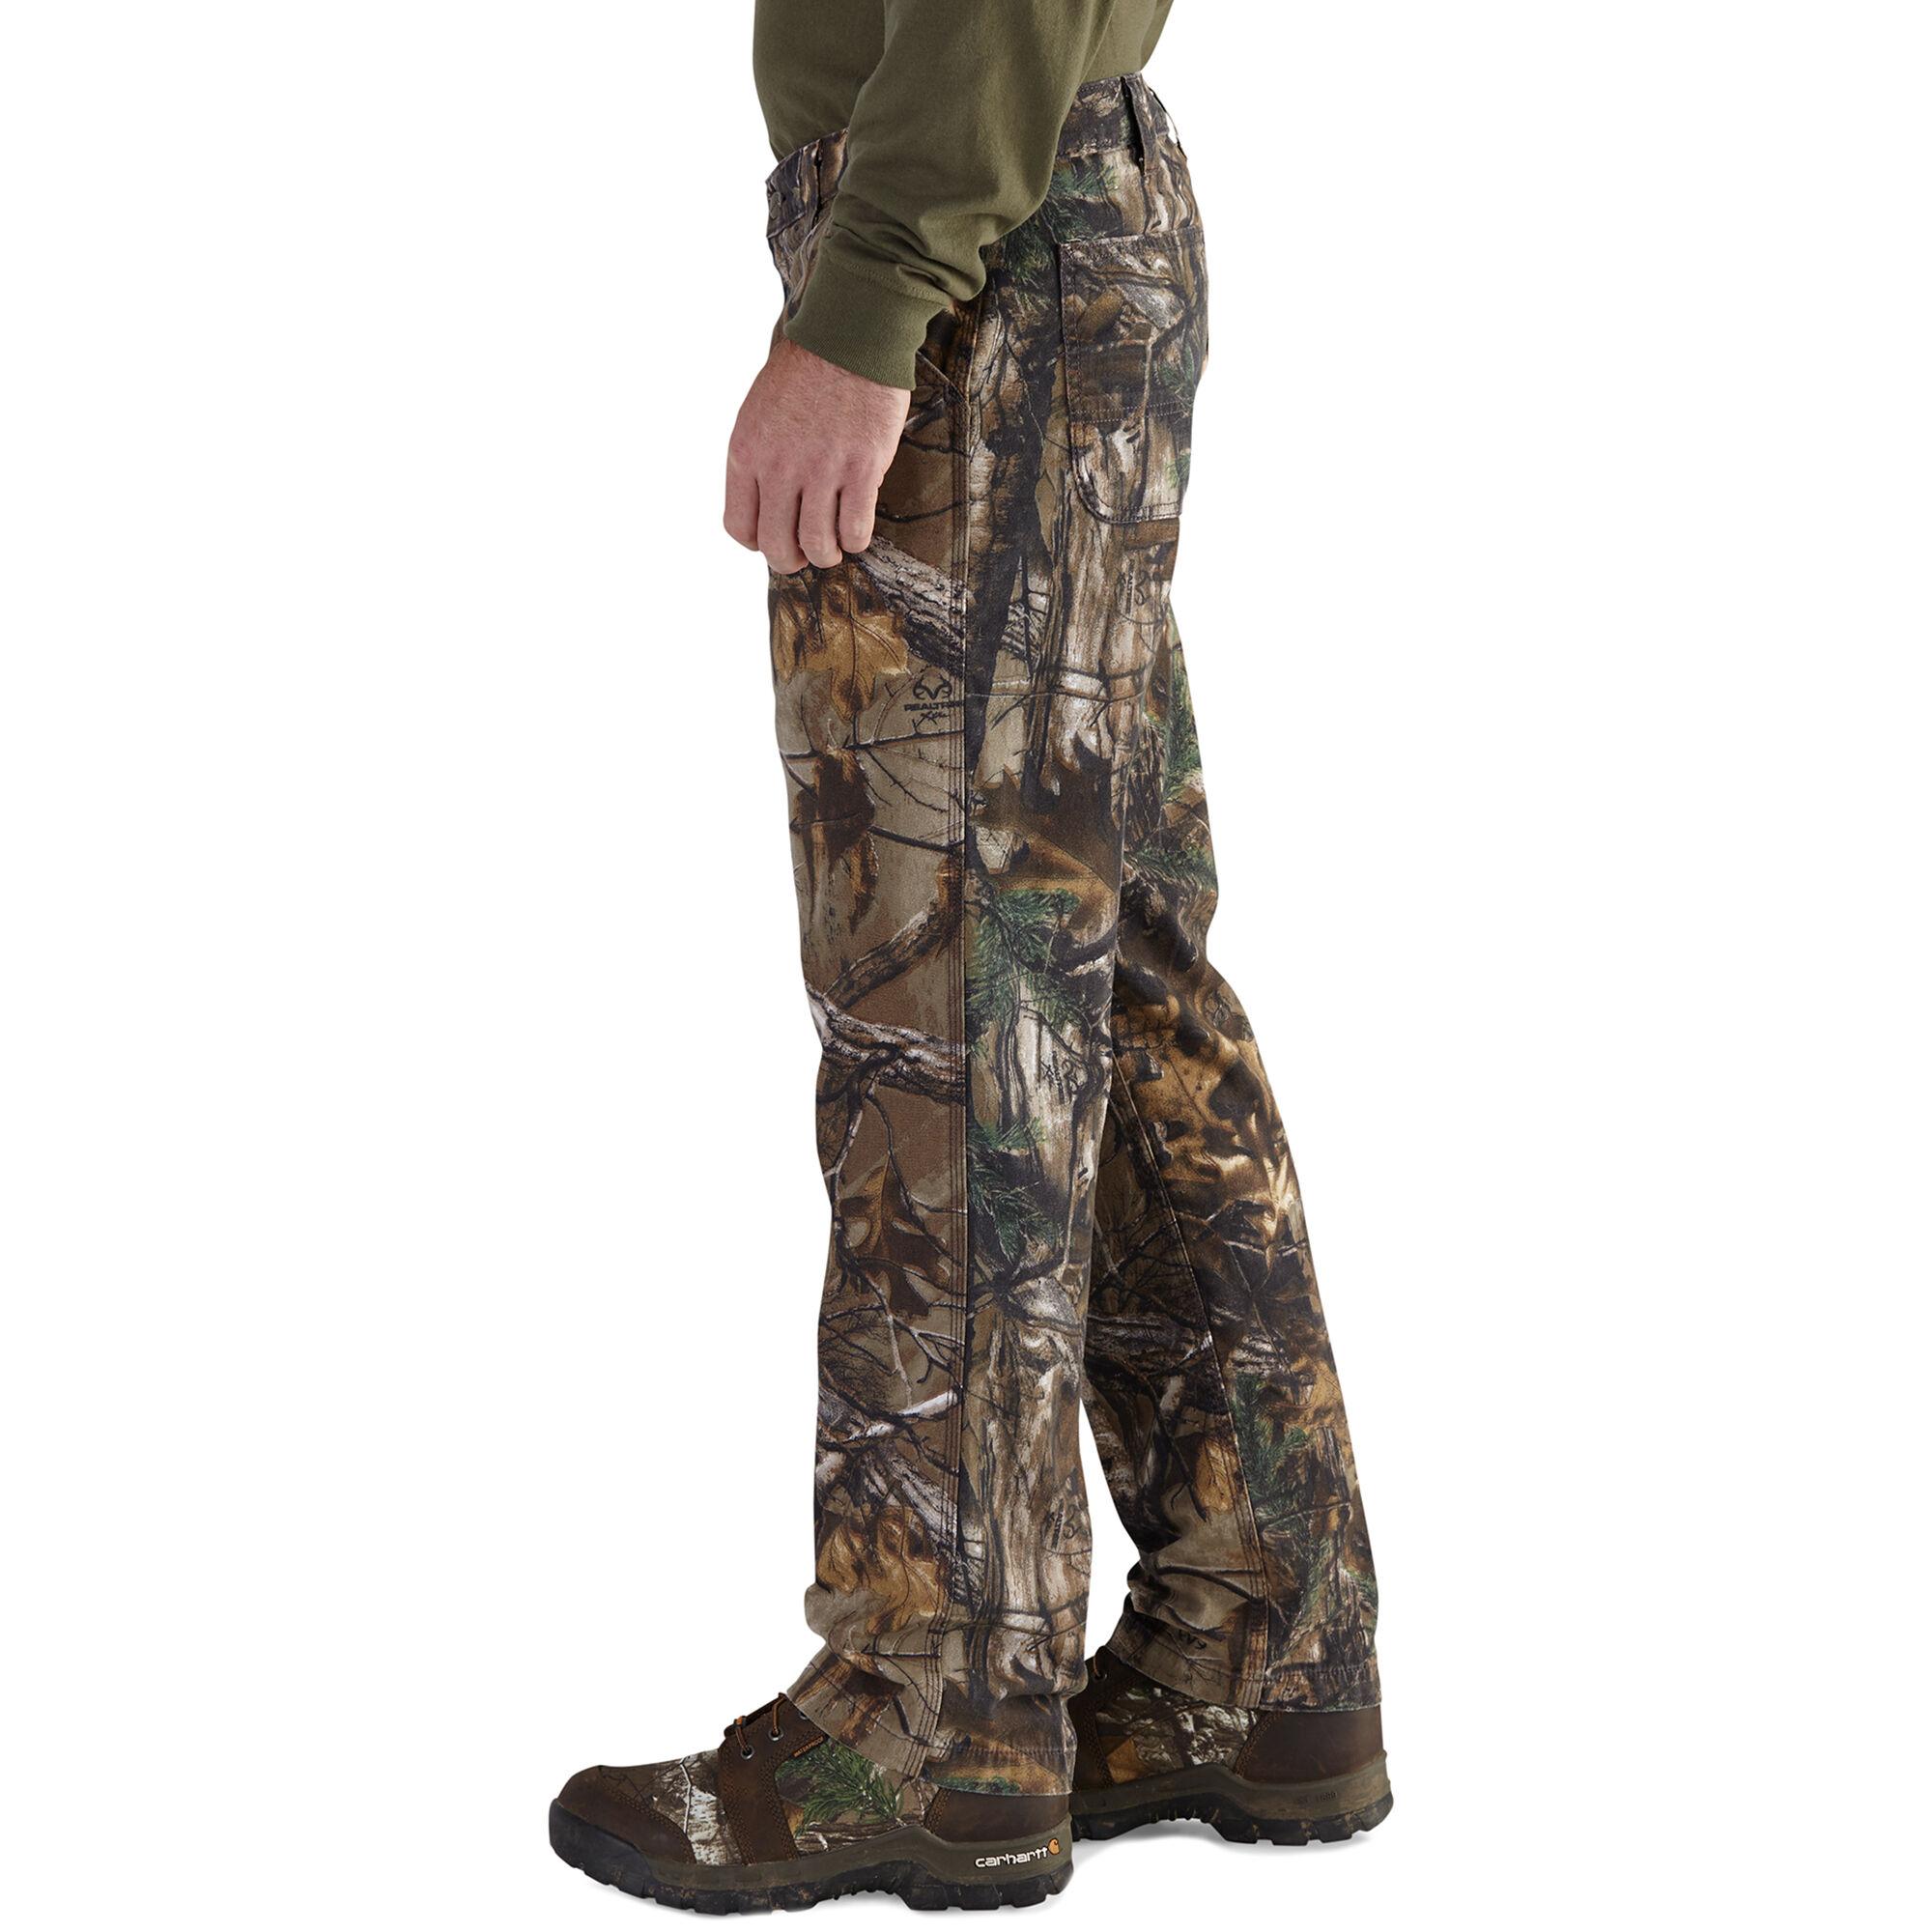 Carhartt Mens Rugged Flex Rigby Camo Dungaree Pant Pants